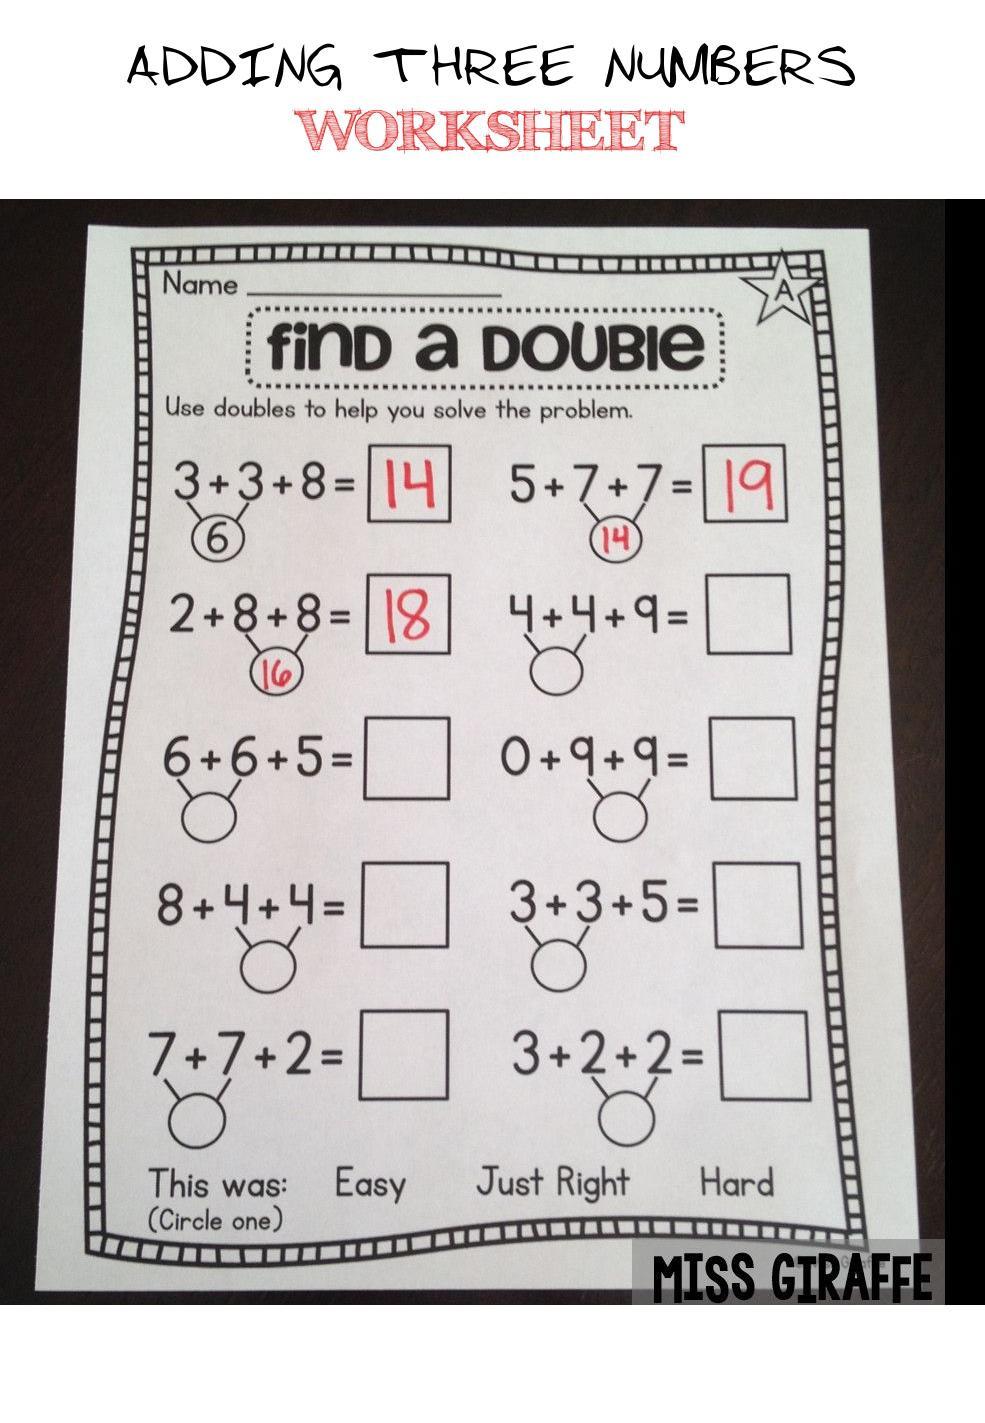 Adding Three Numbers Worksheet